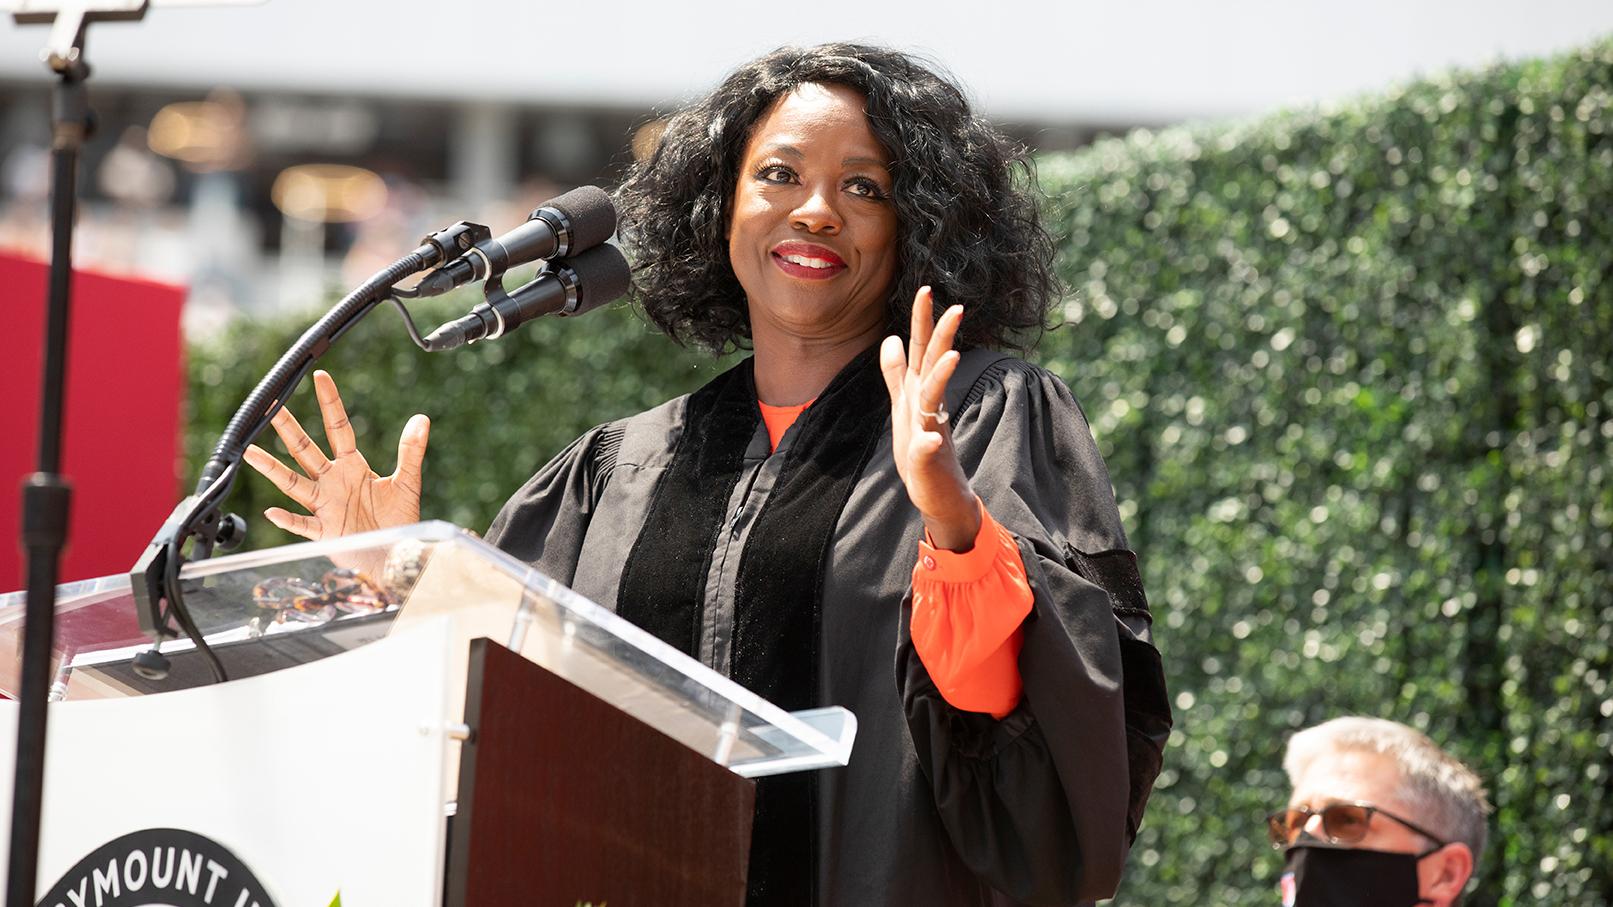 Viola Davis Addresses the Graduating Classes of 2020 and 2021